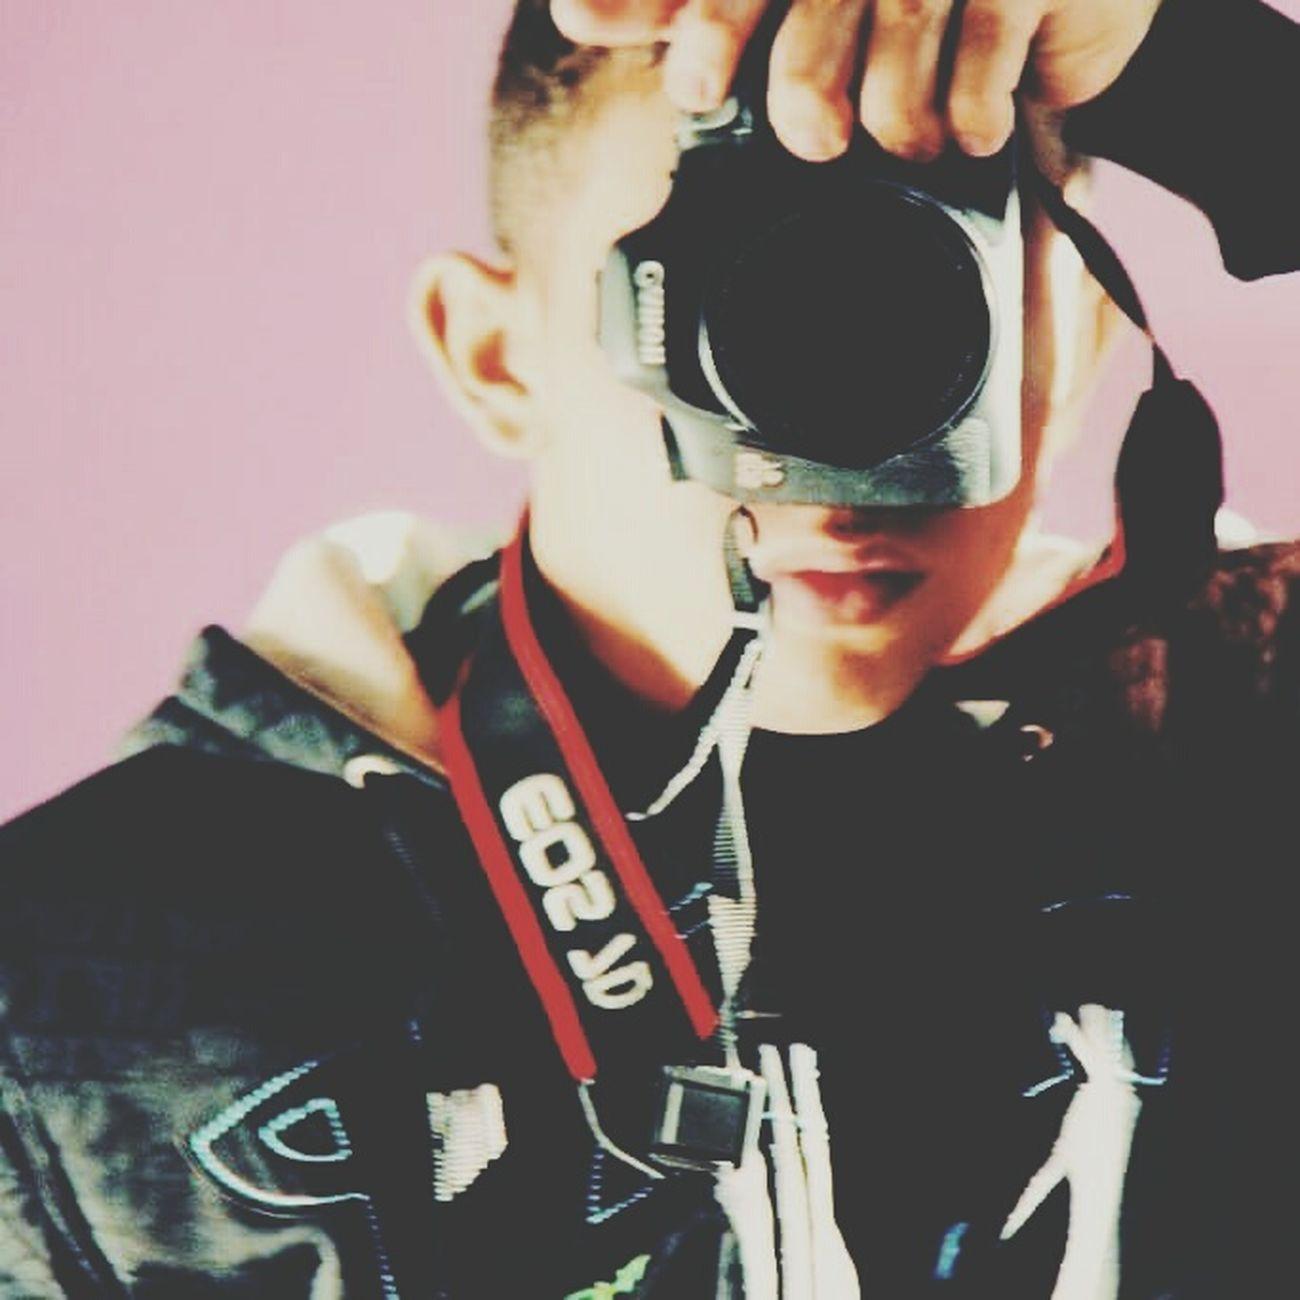 Canon 💜💜💜💜💜 Hanging Out Taking Photos Feliz :) Brasil ♥ Cute♡ Boy Guy Photography Love ♥ SouAssim